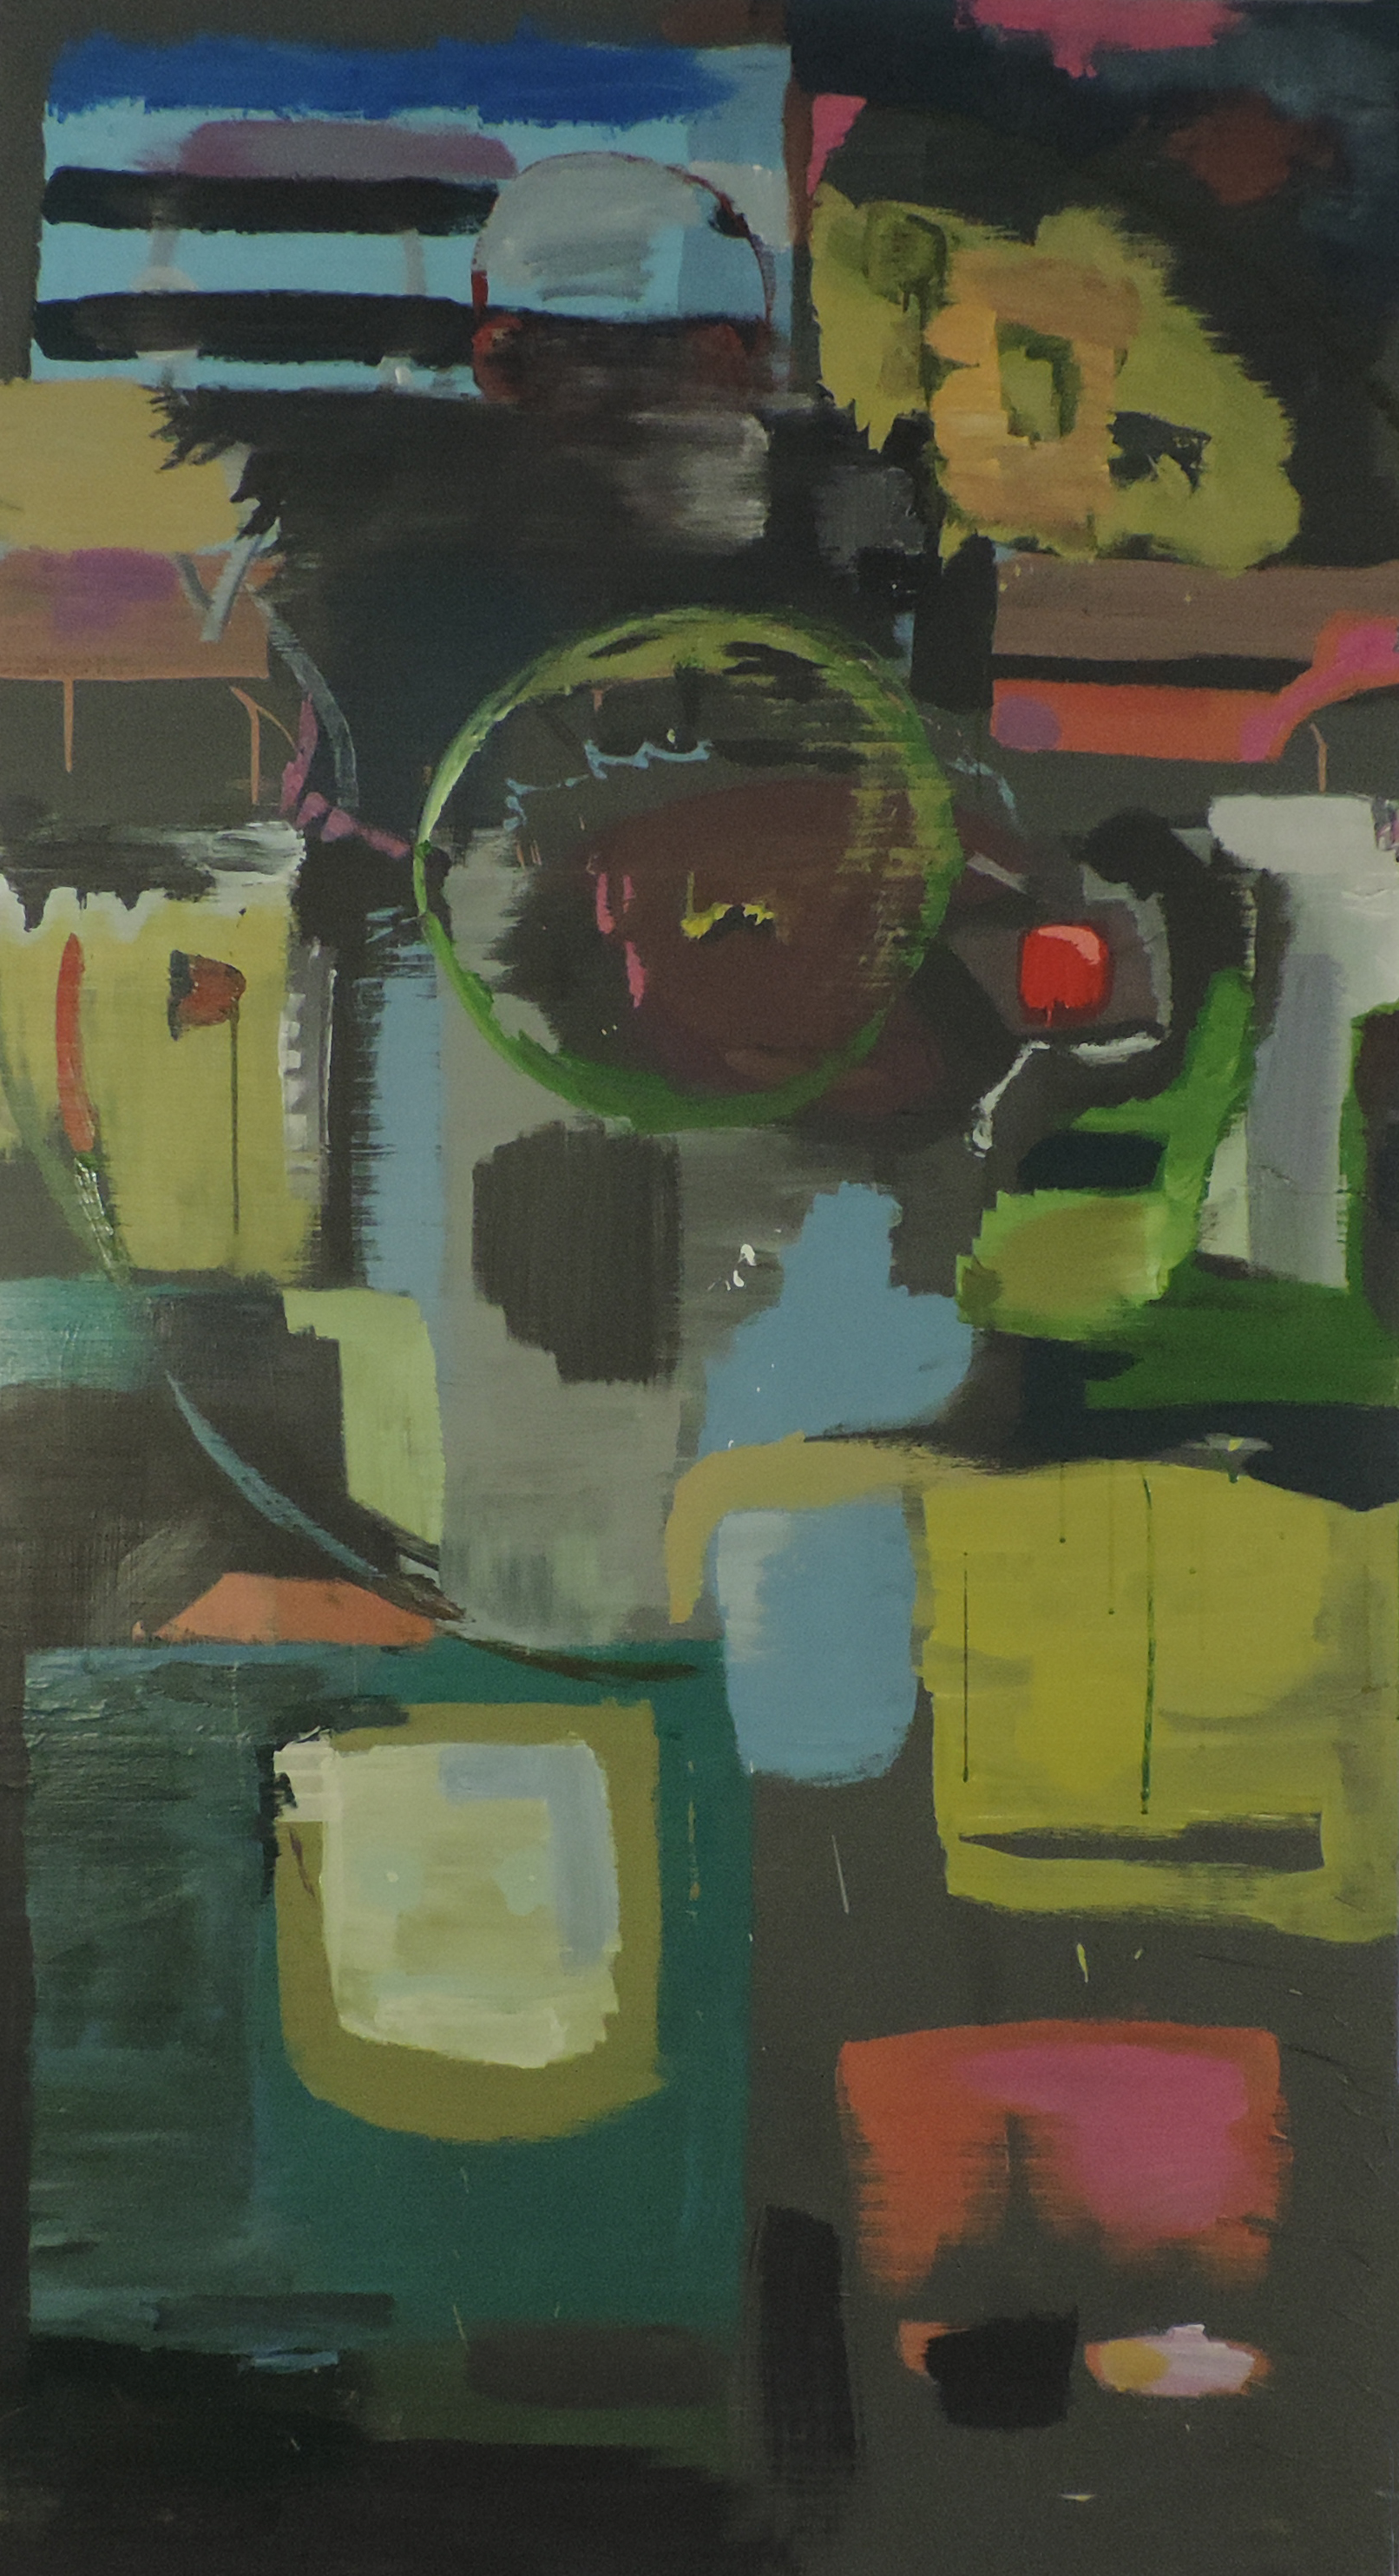 Selfie?  oil on canvas. 7 feet 3 inches x 4 feet